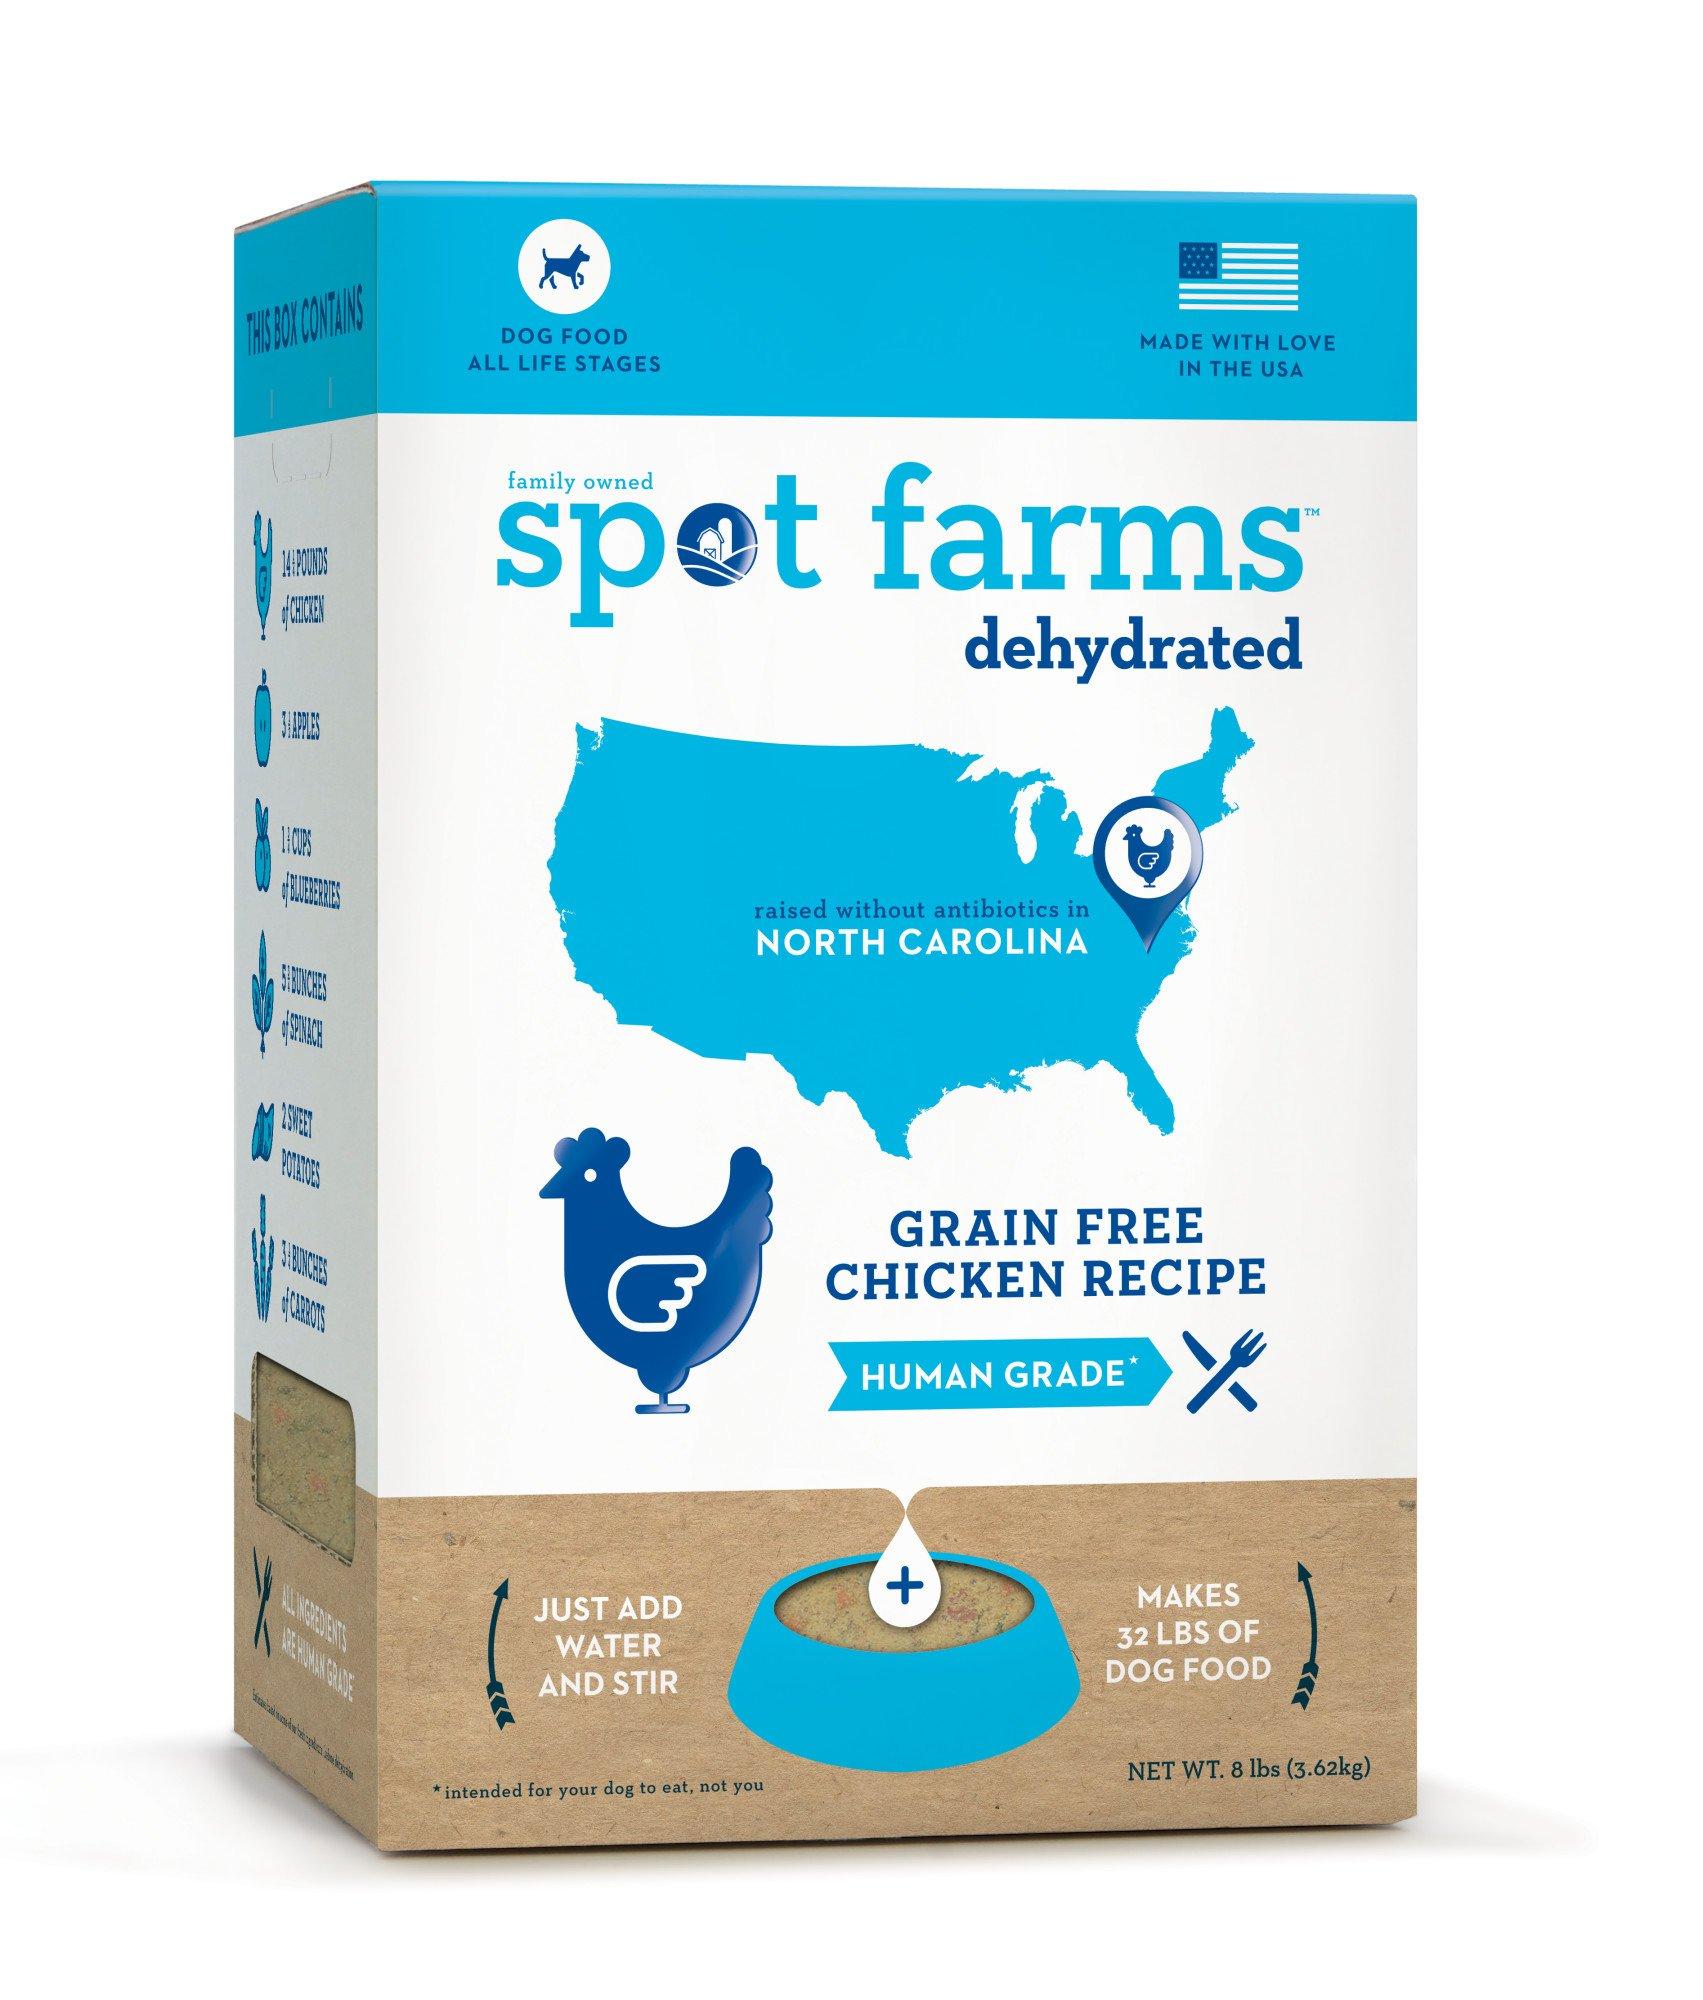 Spot Farms Grain Free Chicken Dog Food, Natural Human Grade Dehydrated Dog Food, 8.0lb (Makes 32lbs)